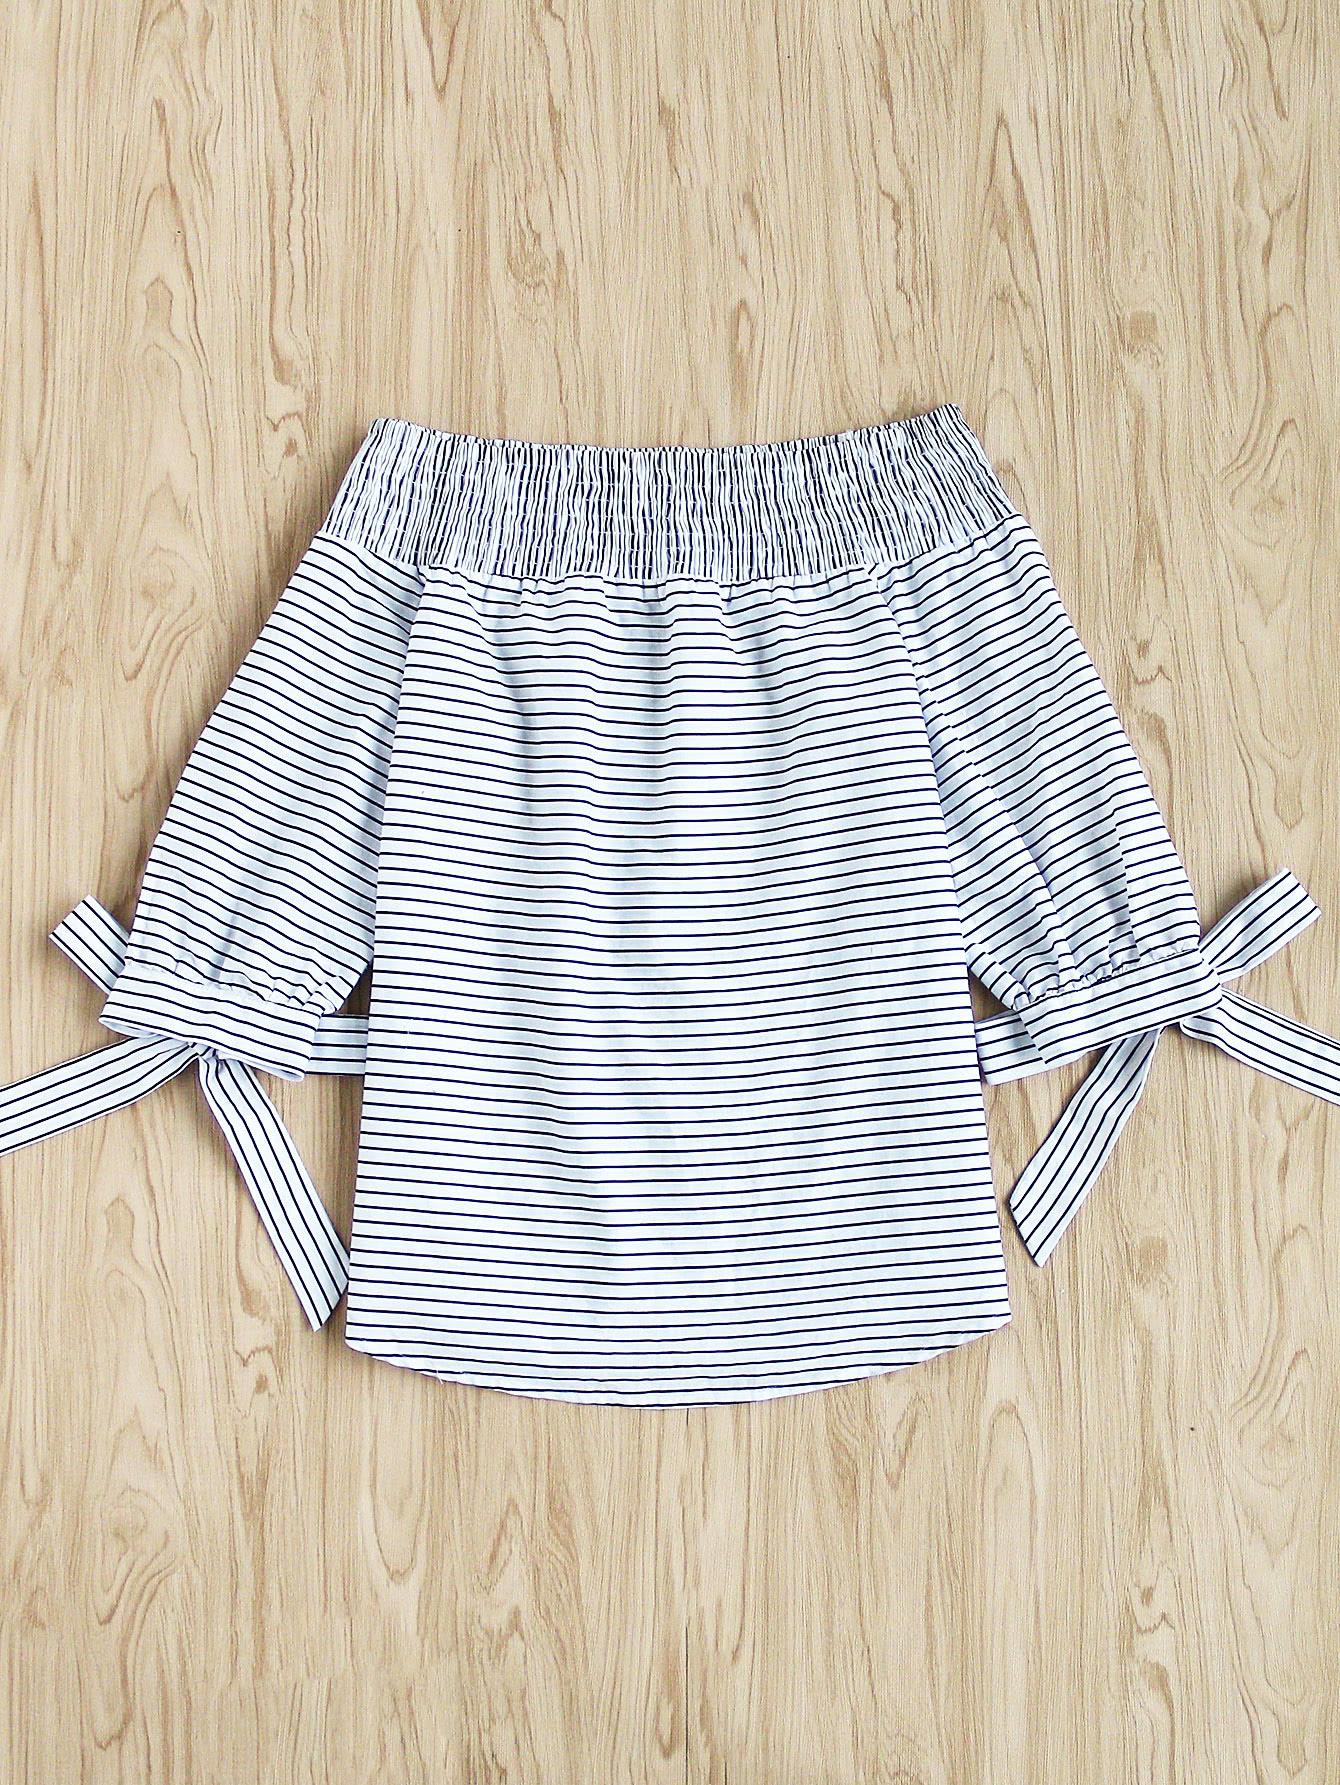 blouse170320703_2